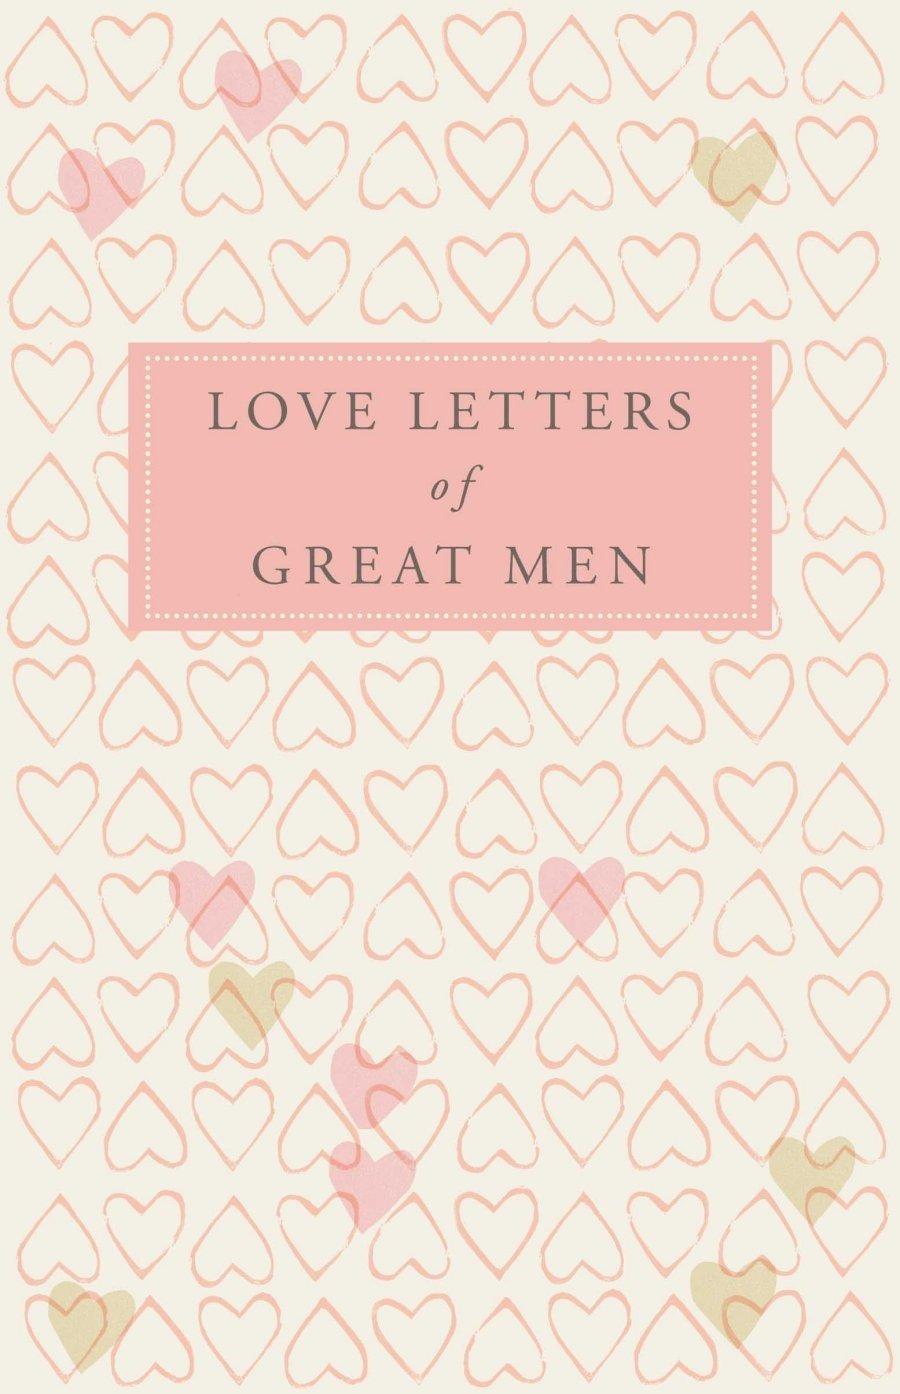 Love Letters of Great Men: Amazon.es: Ursula Doyle: Libros ...